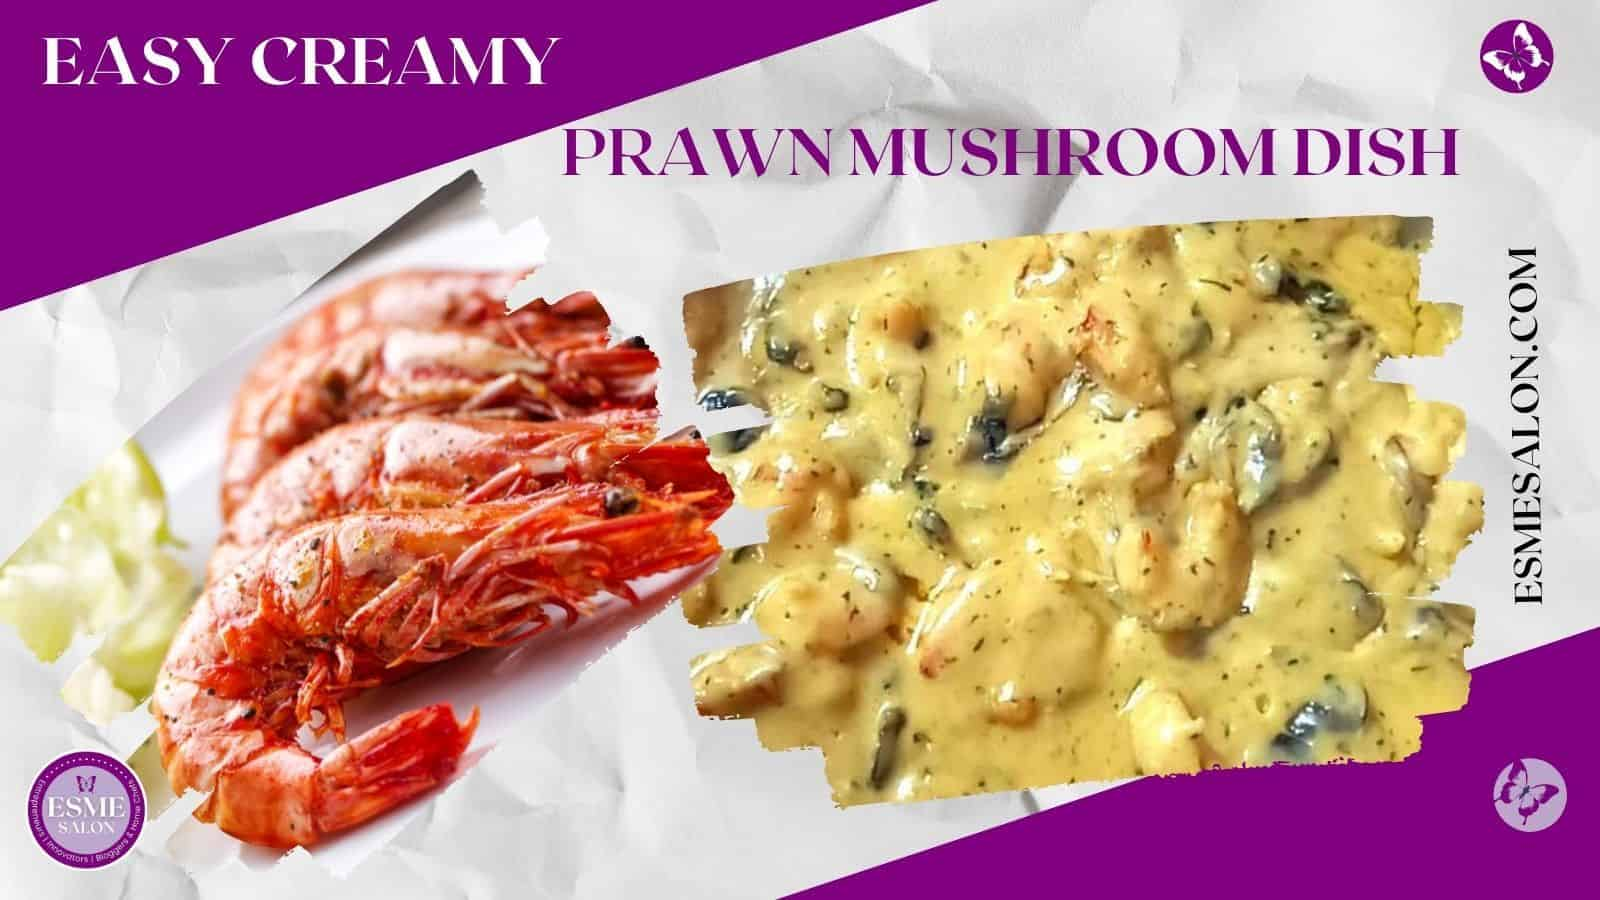 Creamed mushroom sauce and prawns